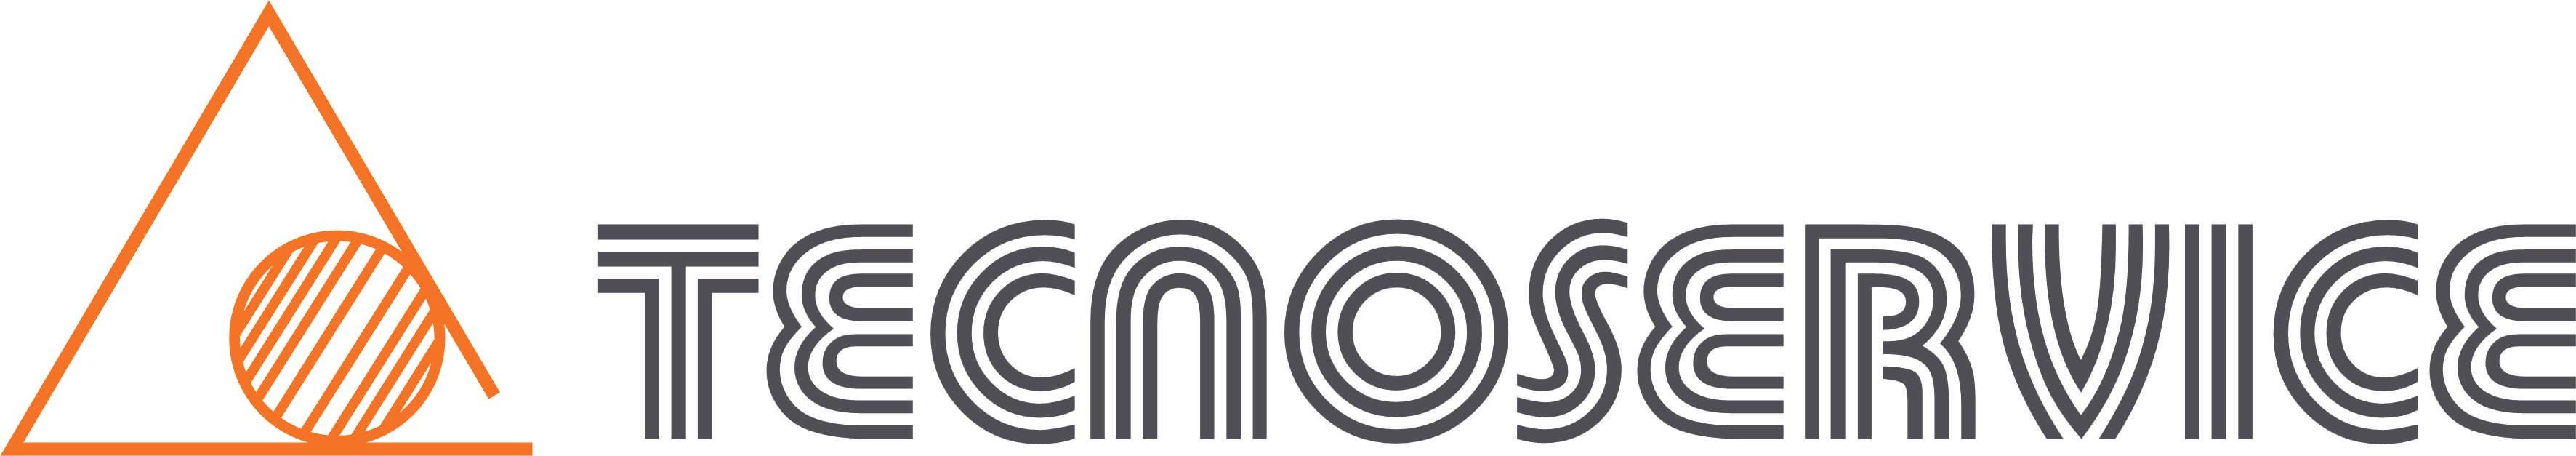 Logo Tecnoservice S.r.l.